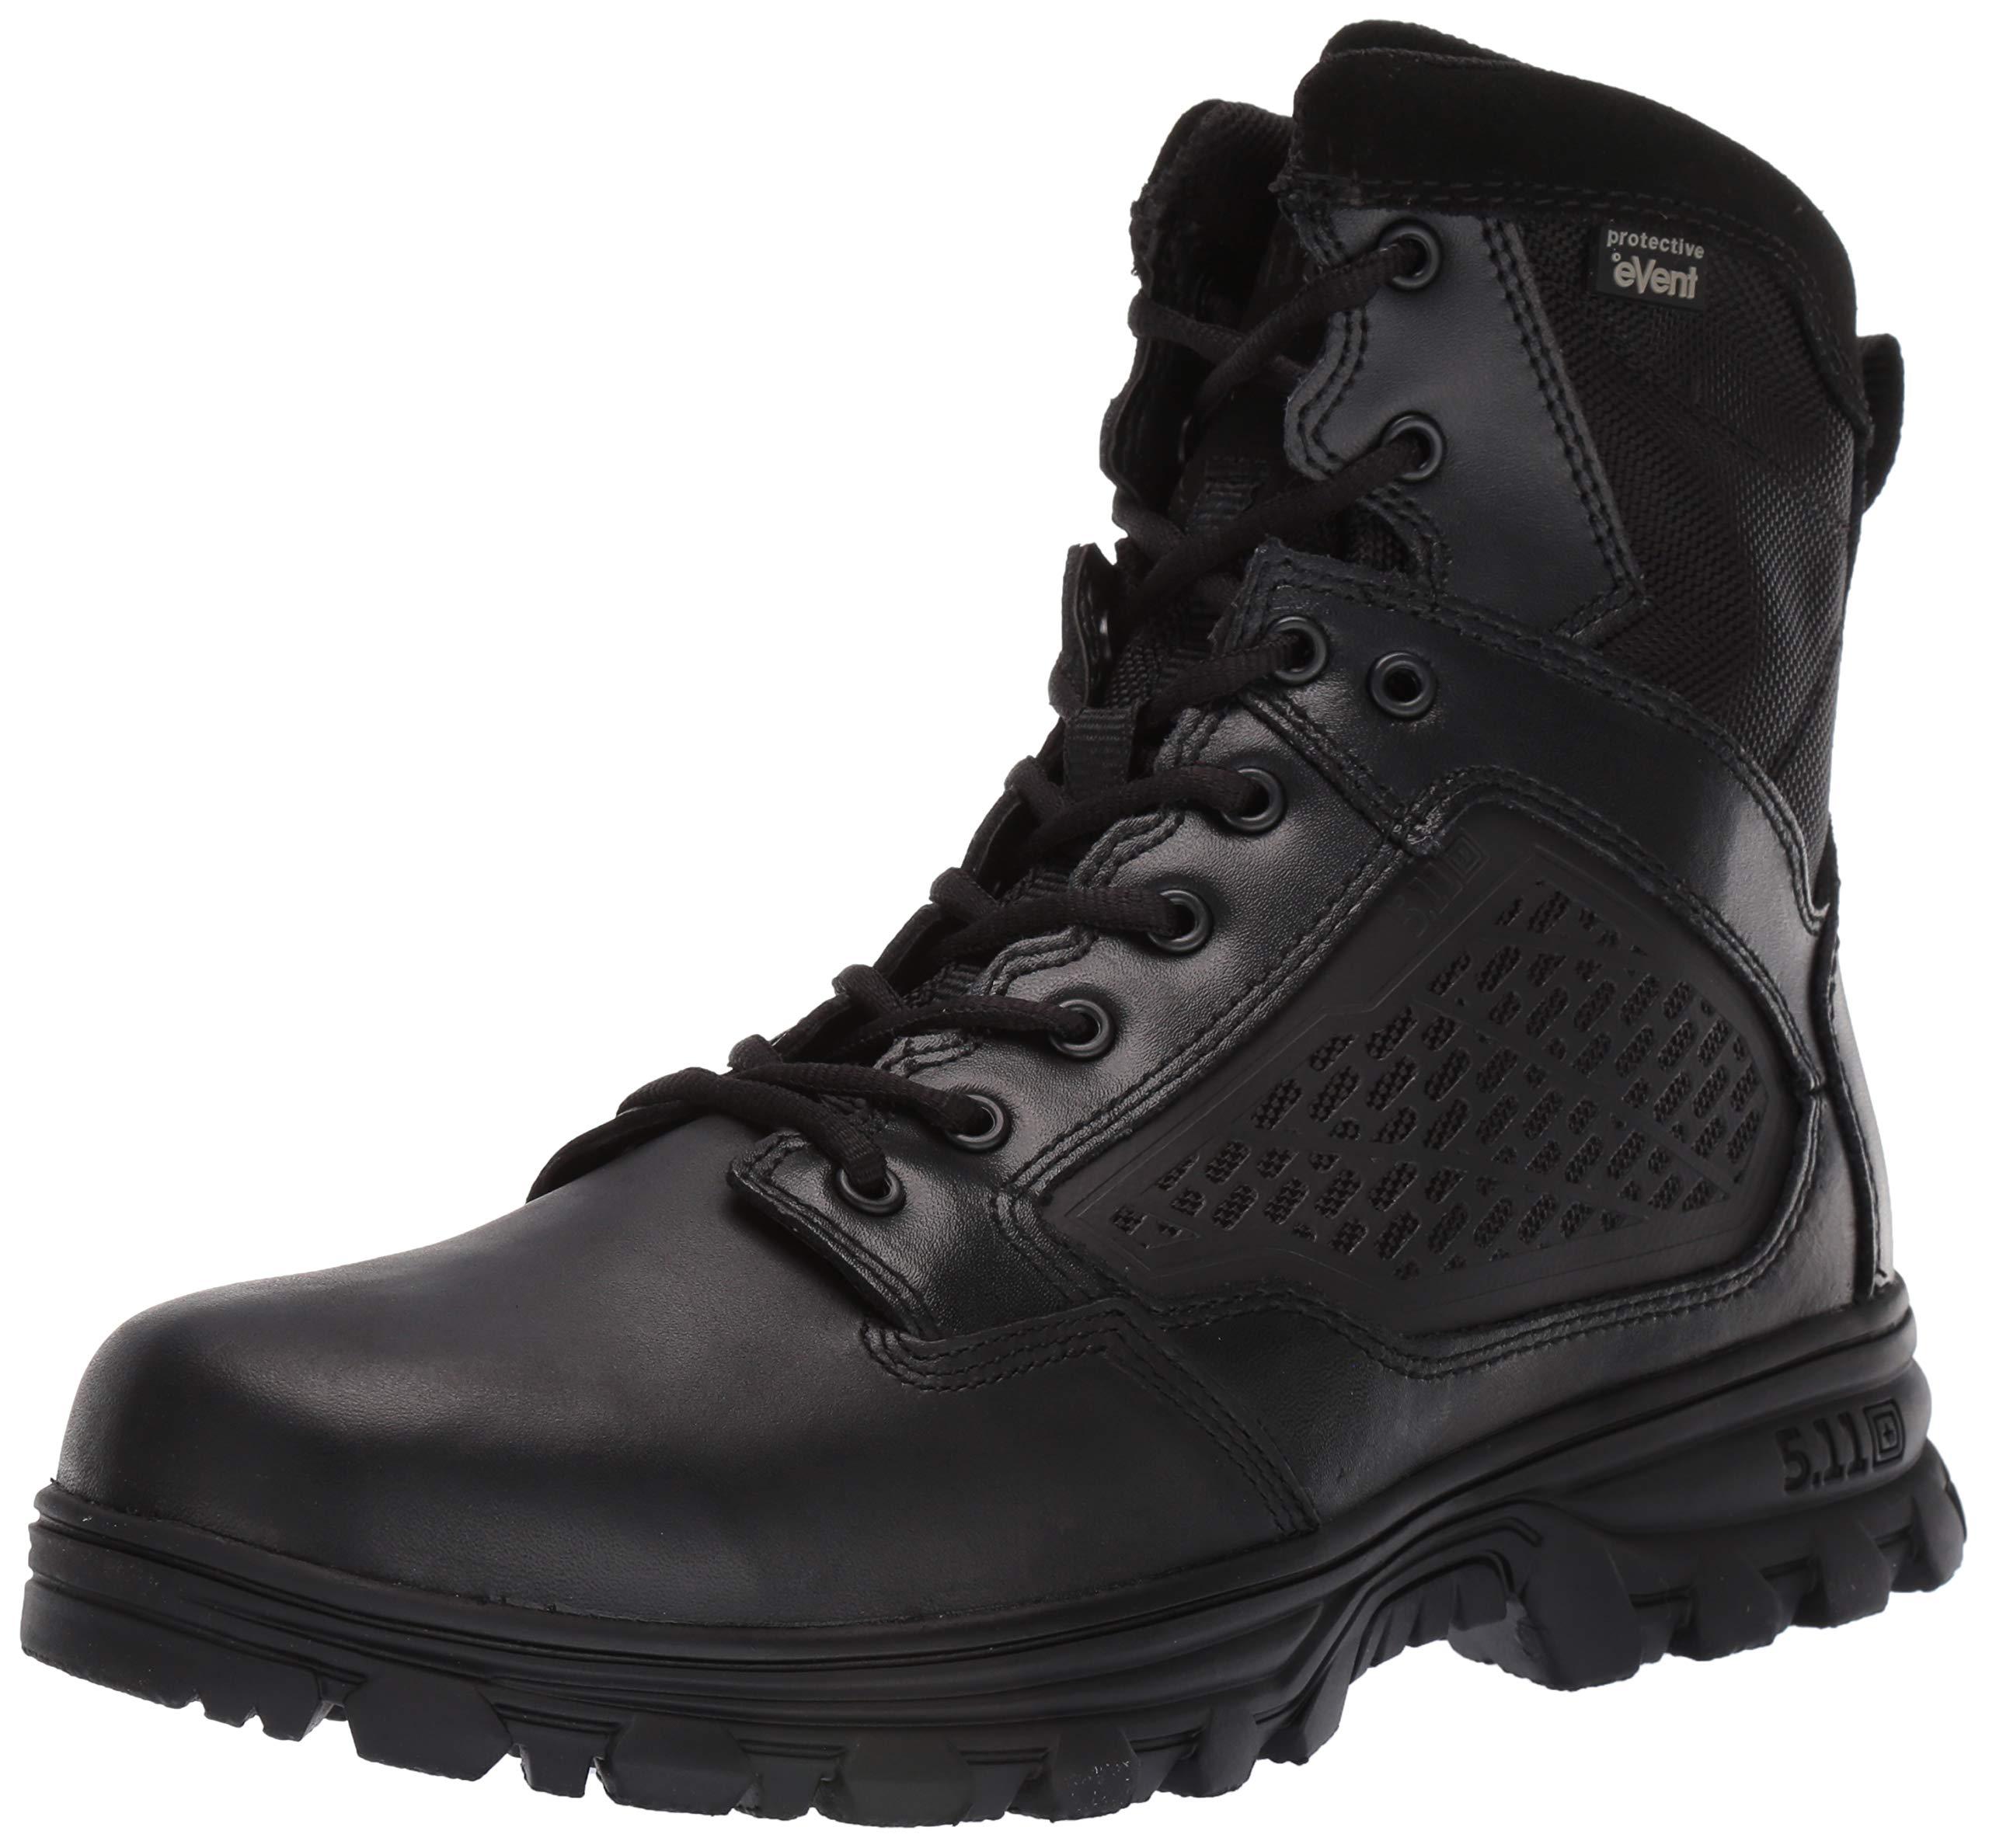 5.11 Men's Evo 6'' Side Zip Waterproof-M, Black 7 D(M) US by 5.11